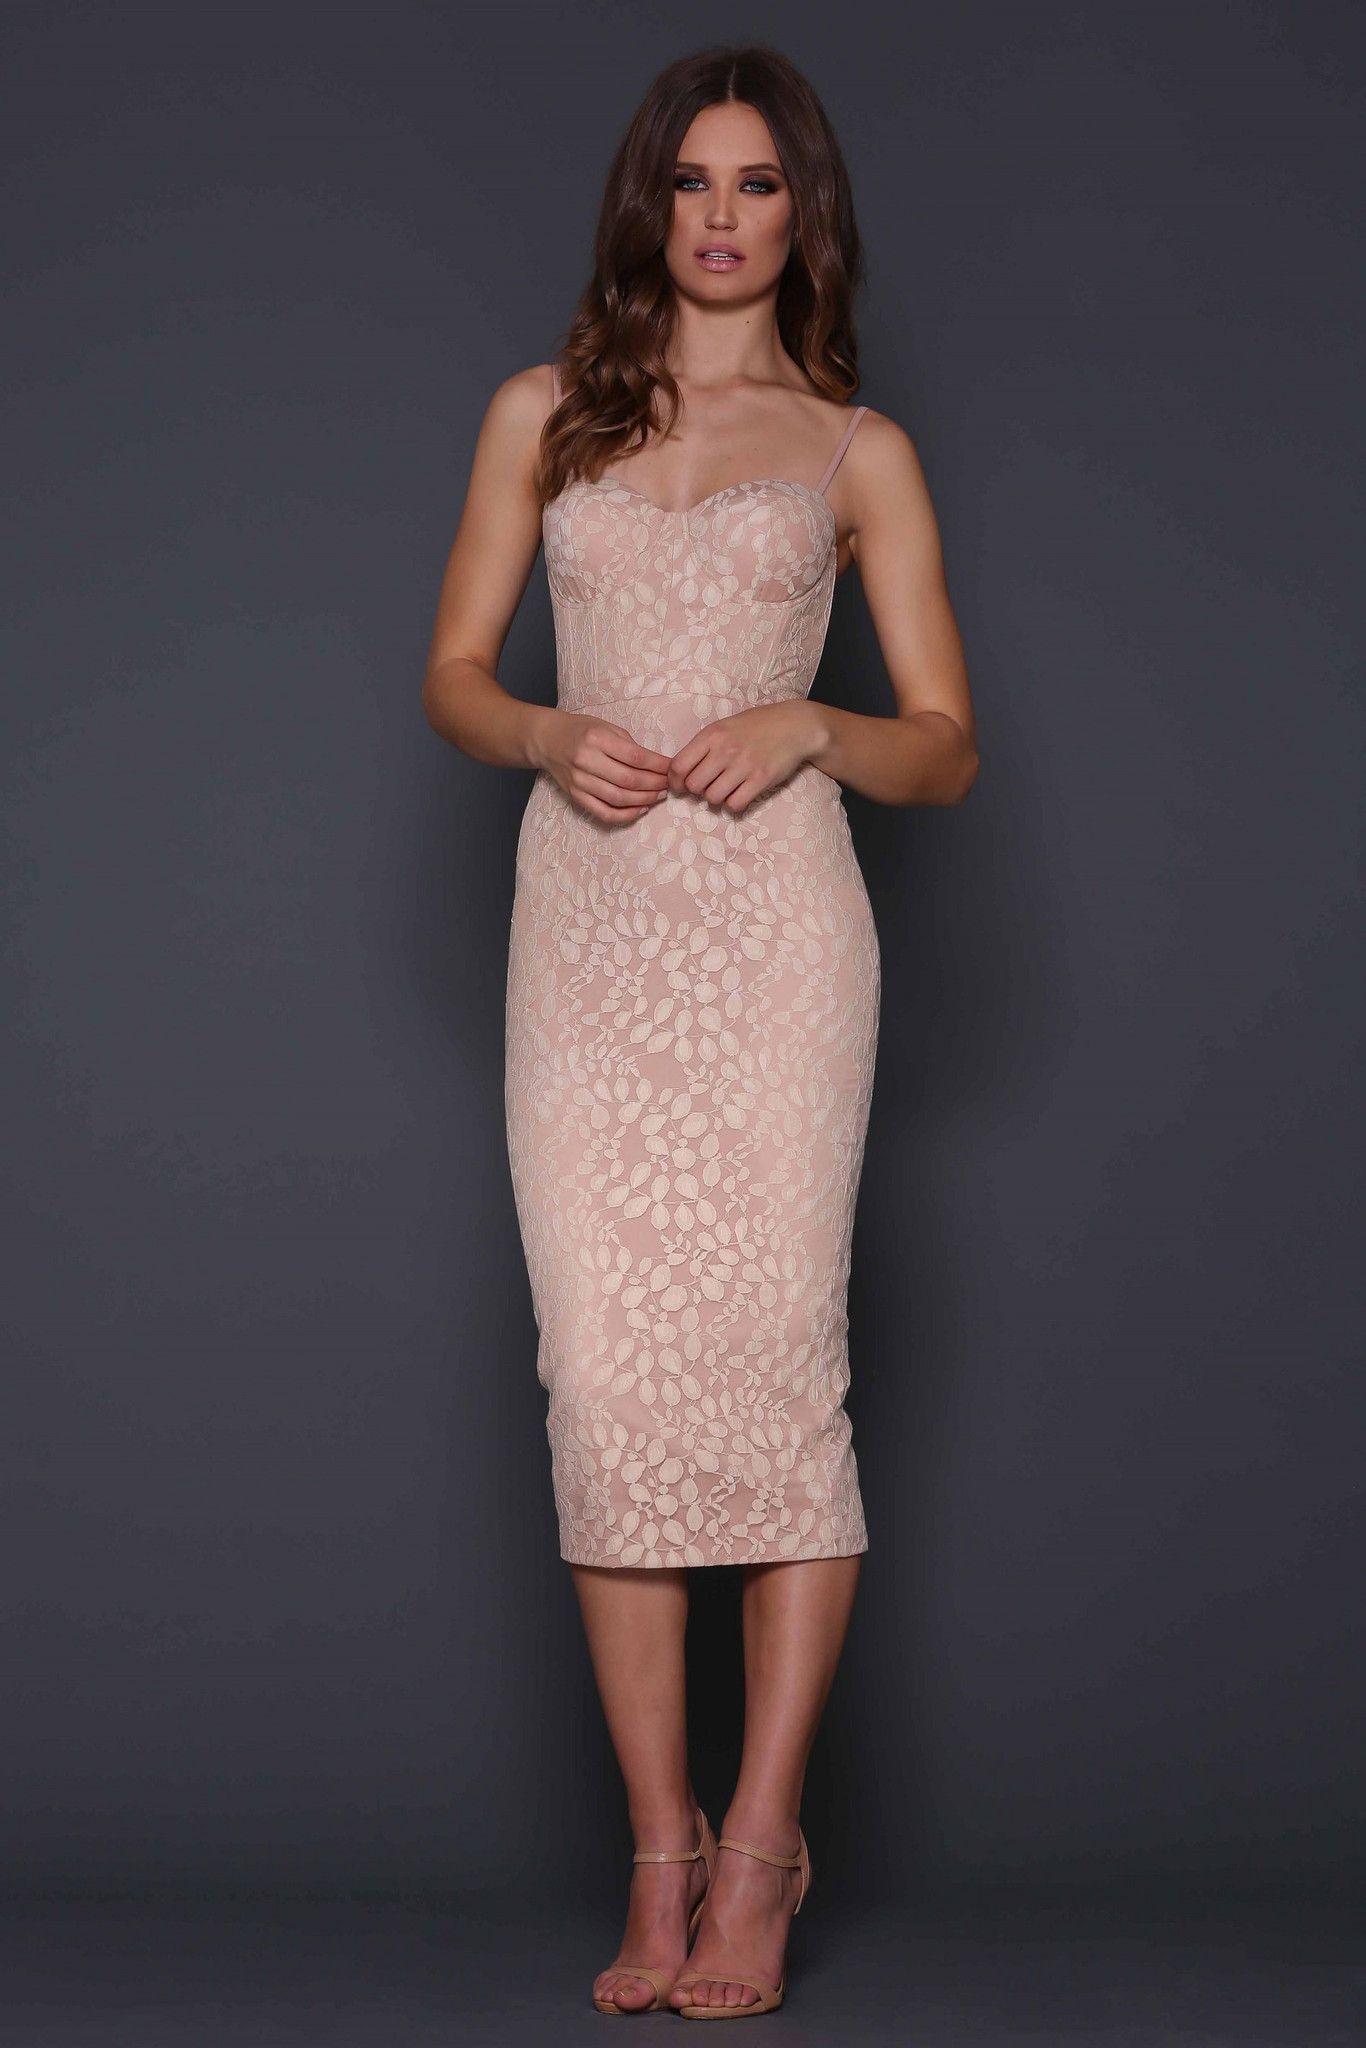 Elle Zeitoune - Leoni Dress - Nude | Elle Zeitoune | Pinterest